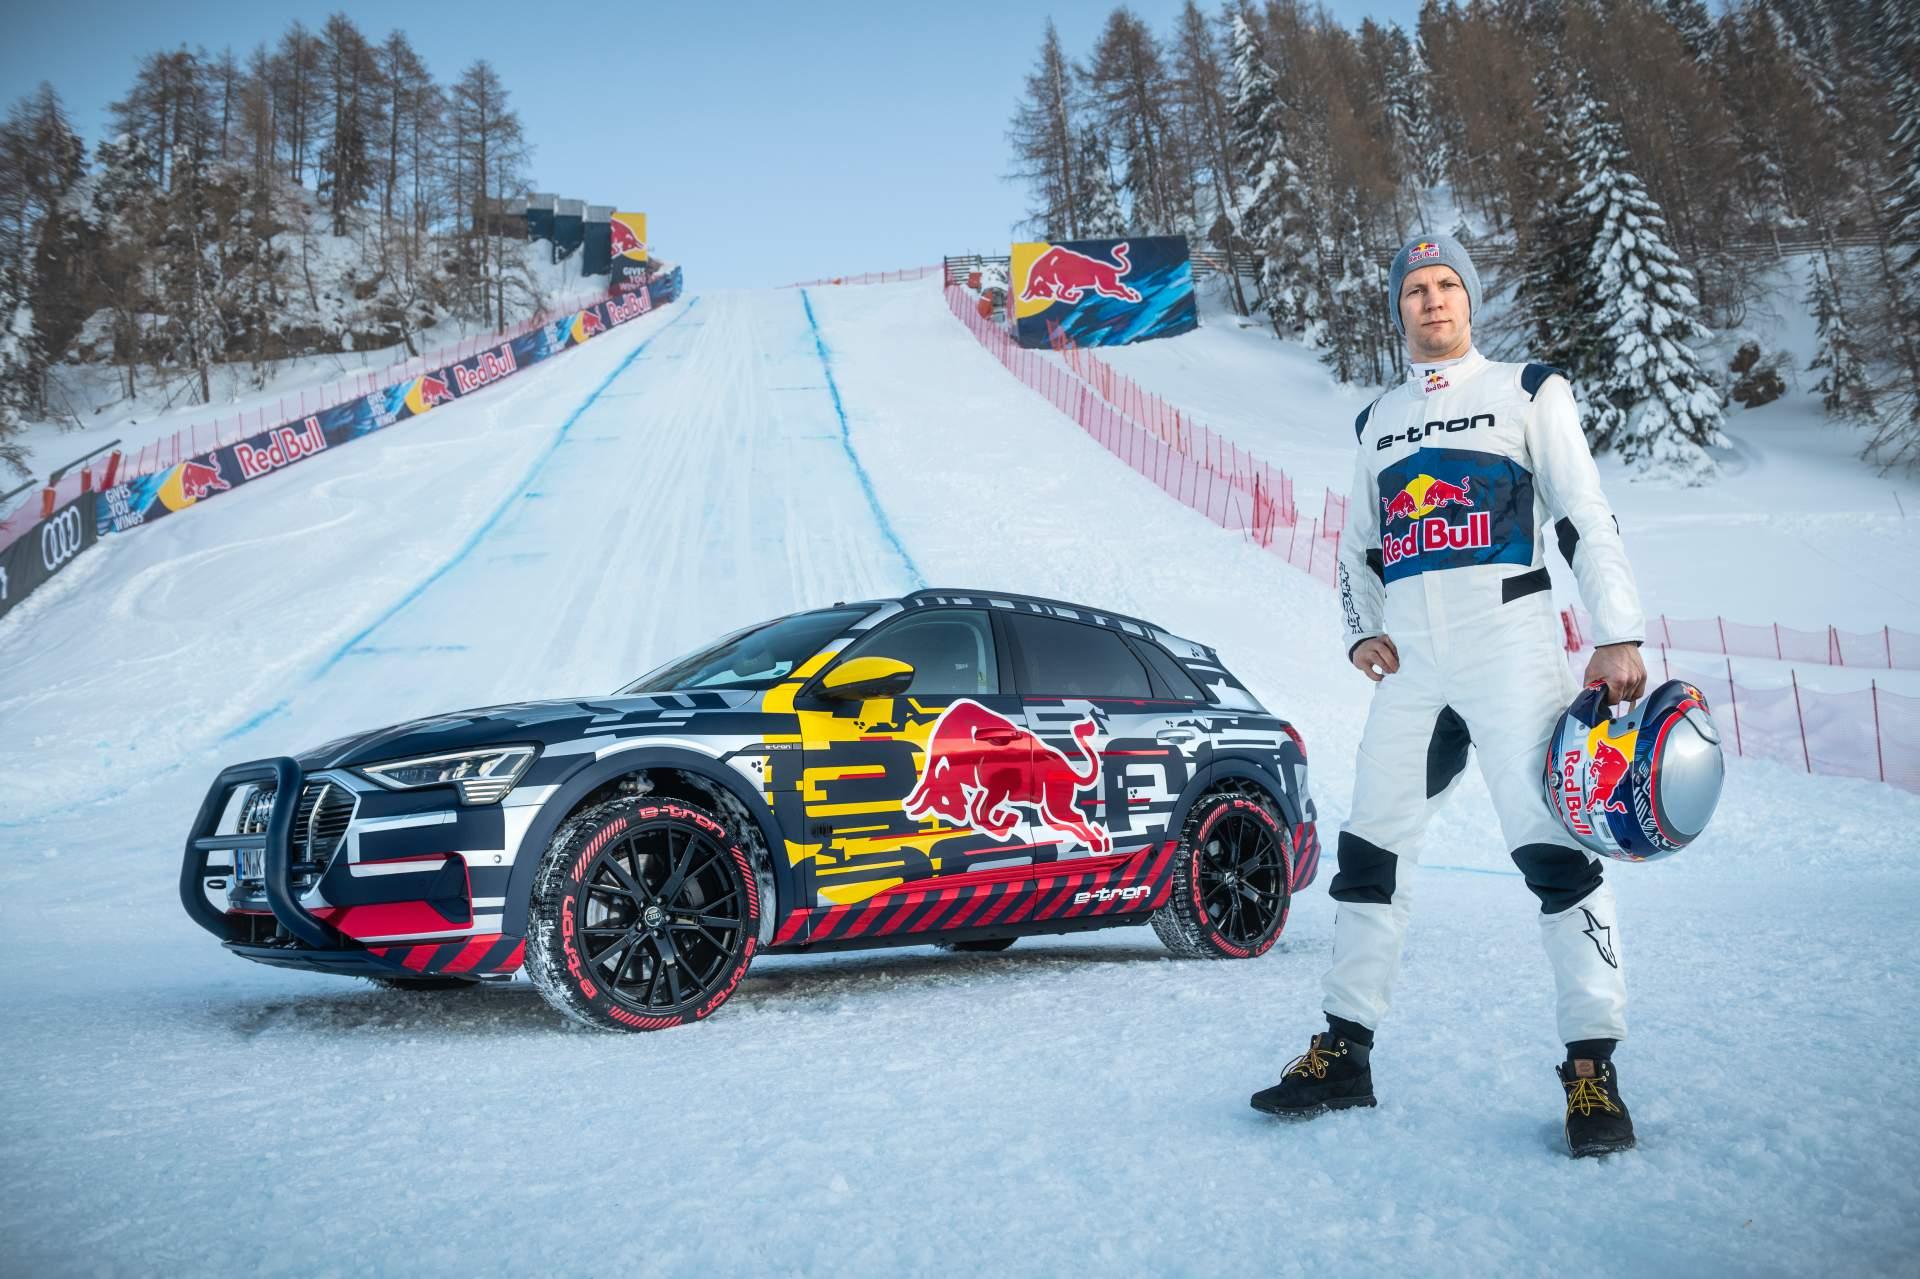 Audi E-Tron Ski (6)